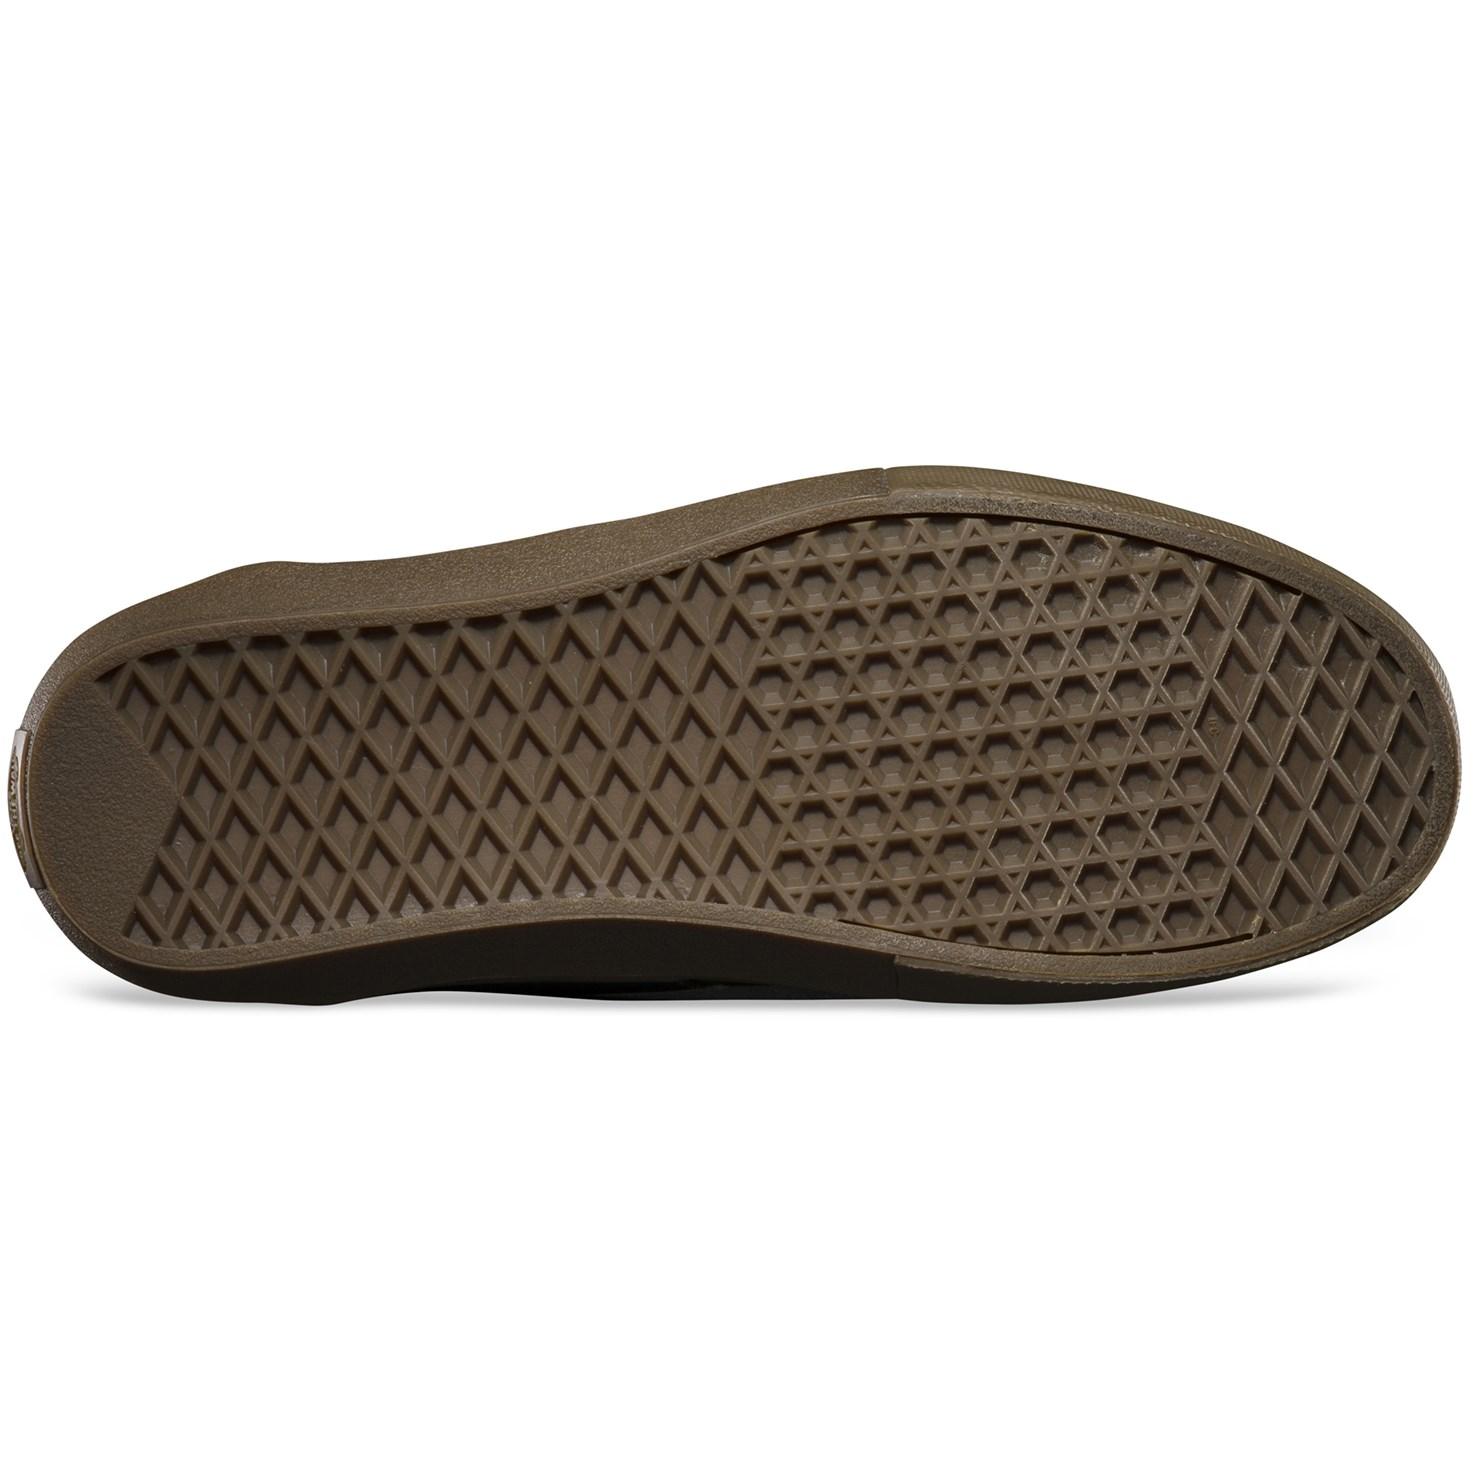 b79f22c68c31 Vans Euclid Shoes